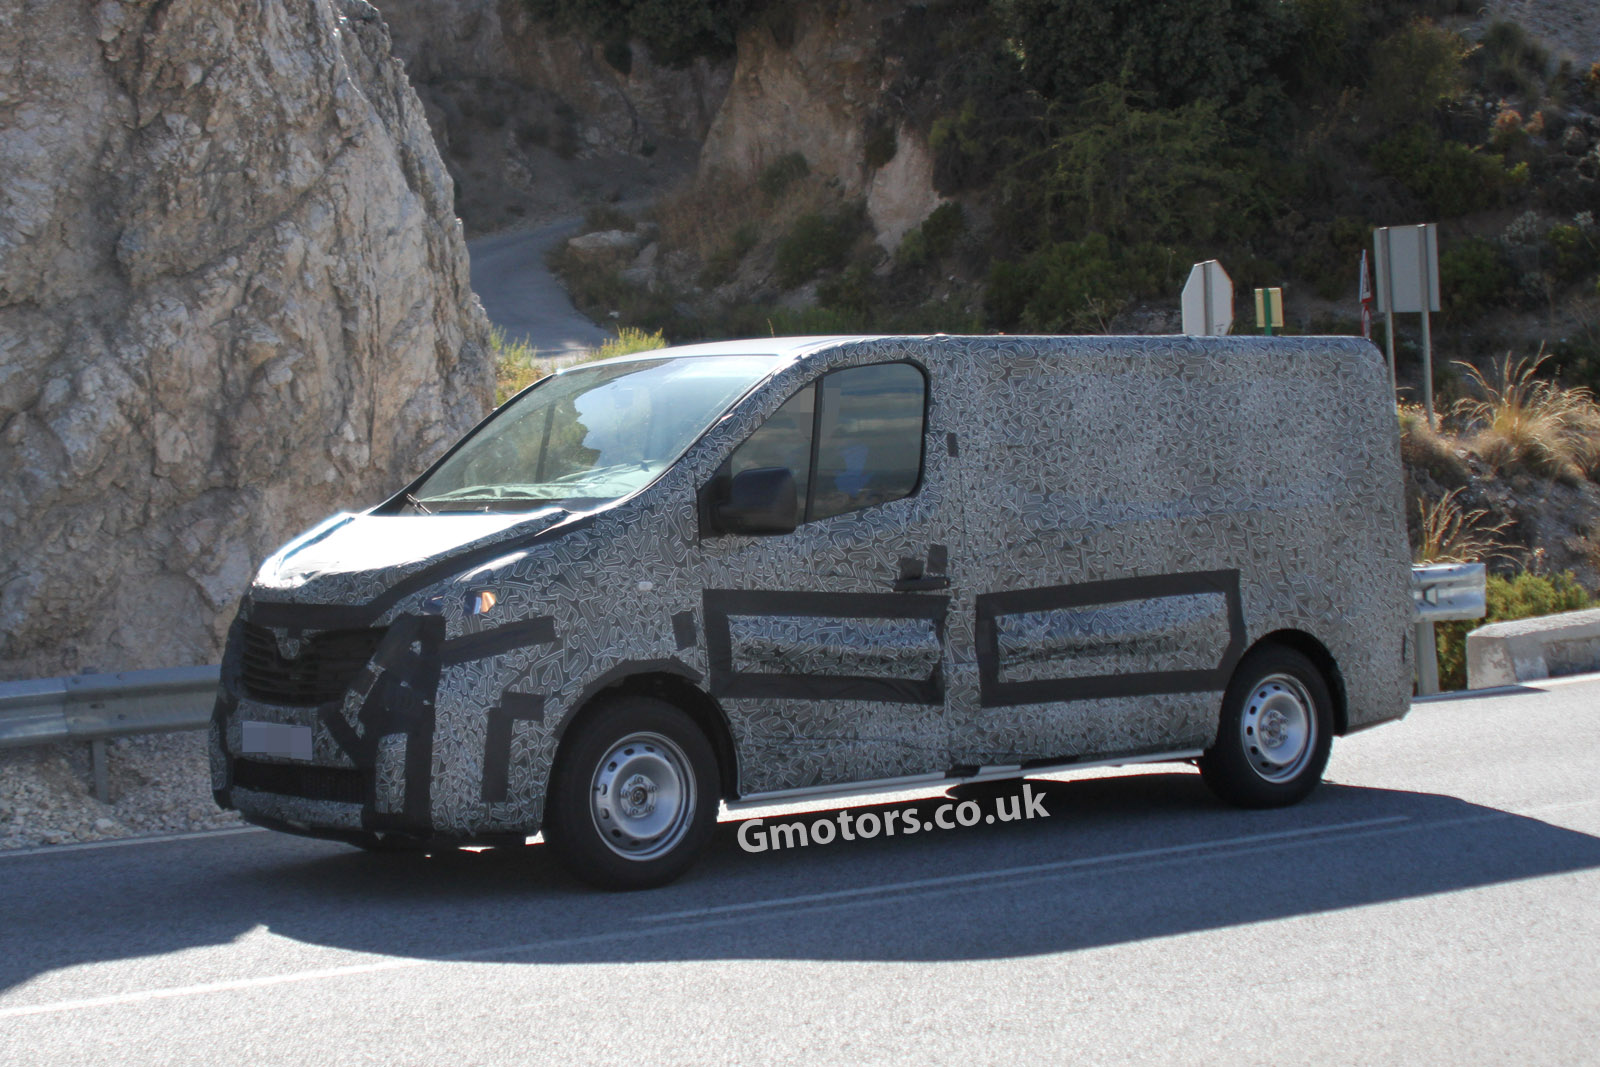 2014 [Renault/Opel/Fiat/Nissan] Trafic/Vivaro/Talento/NV300 - Page 2 2015-Renault-Trafic